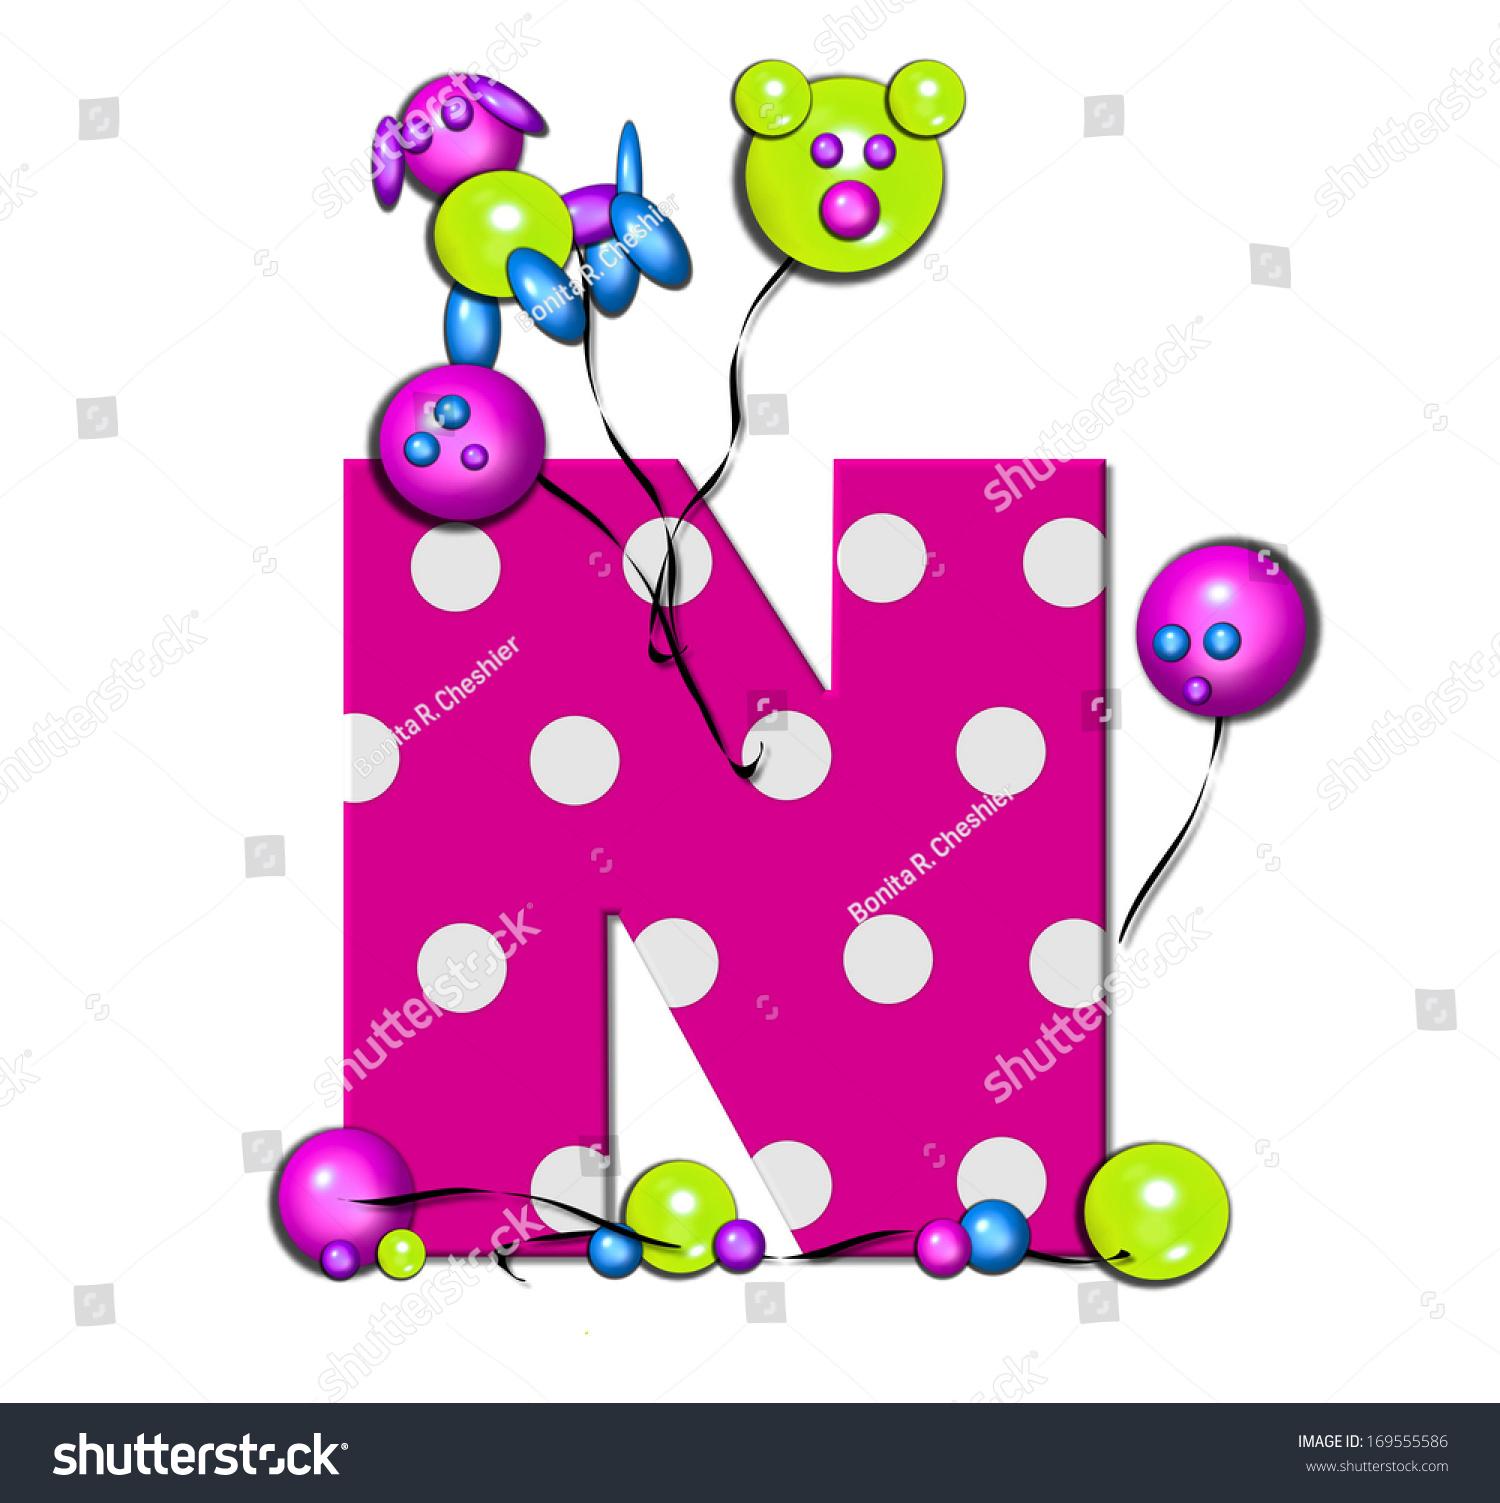 Royalty Free Stock Illustration of Letter N Alphabet Set Party ...